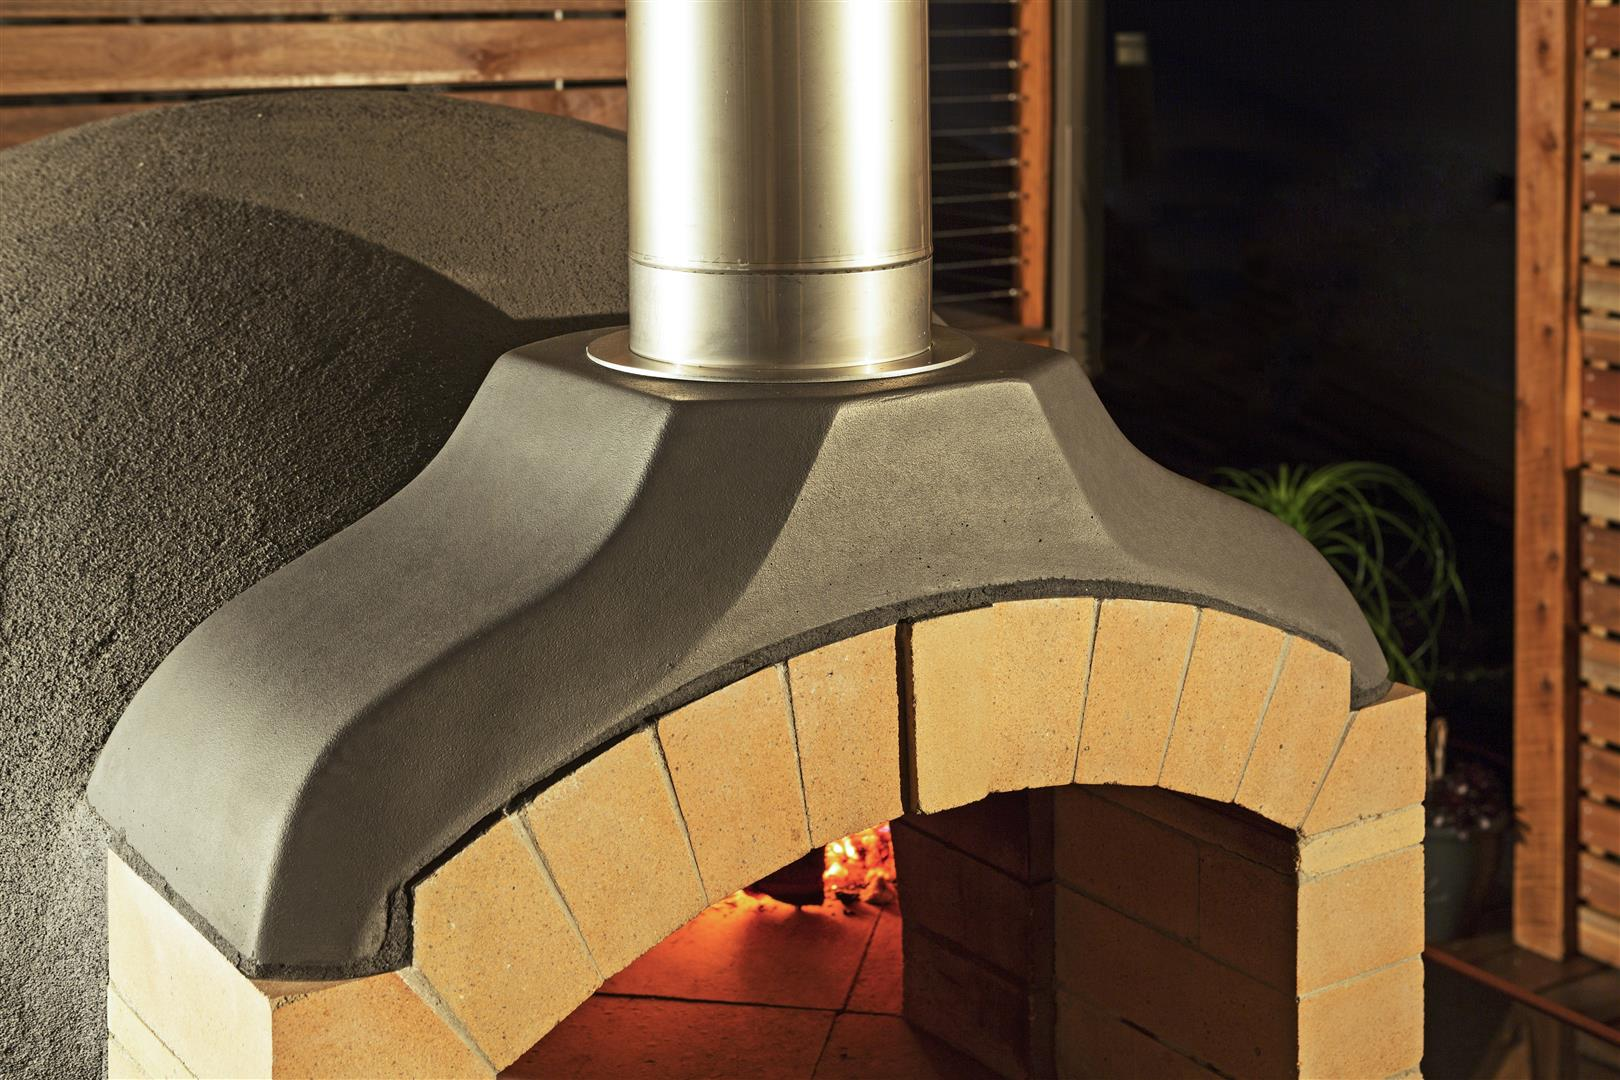 D105 Brick Oven - Dale - 8